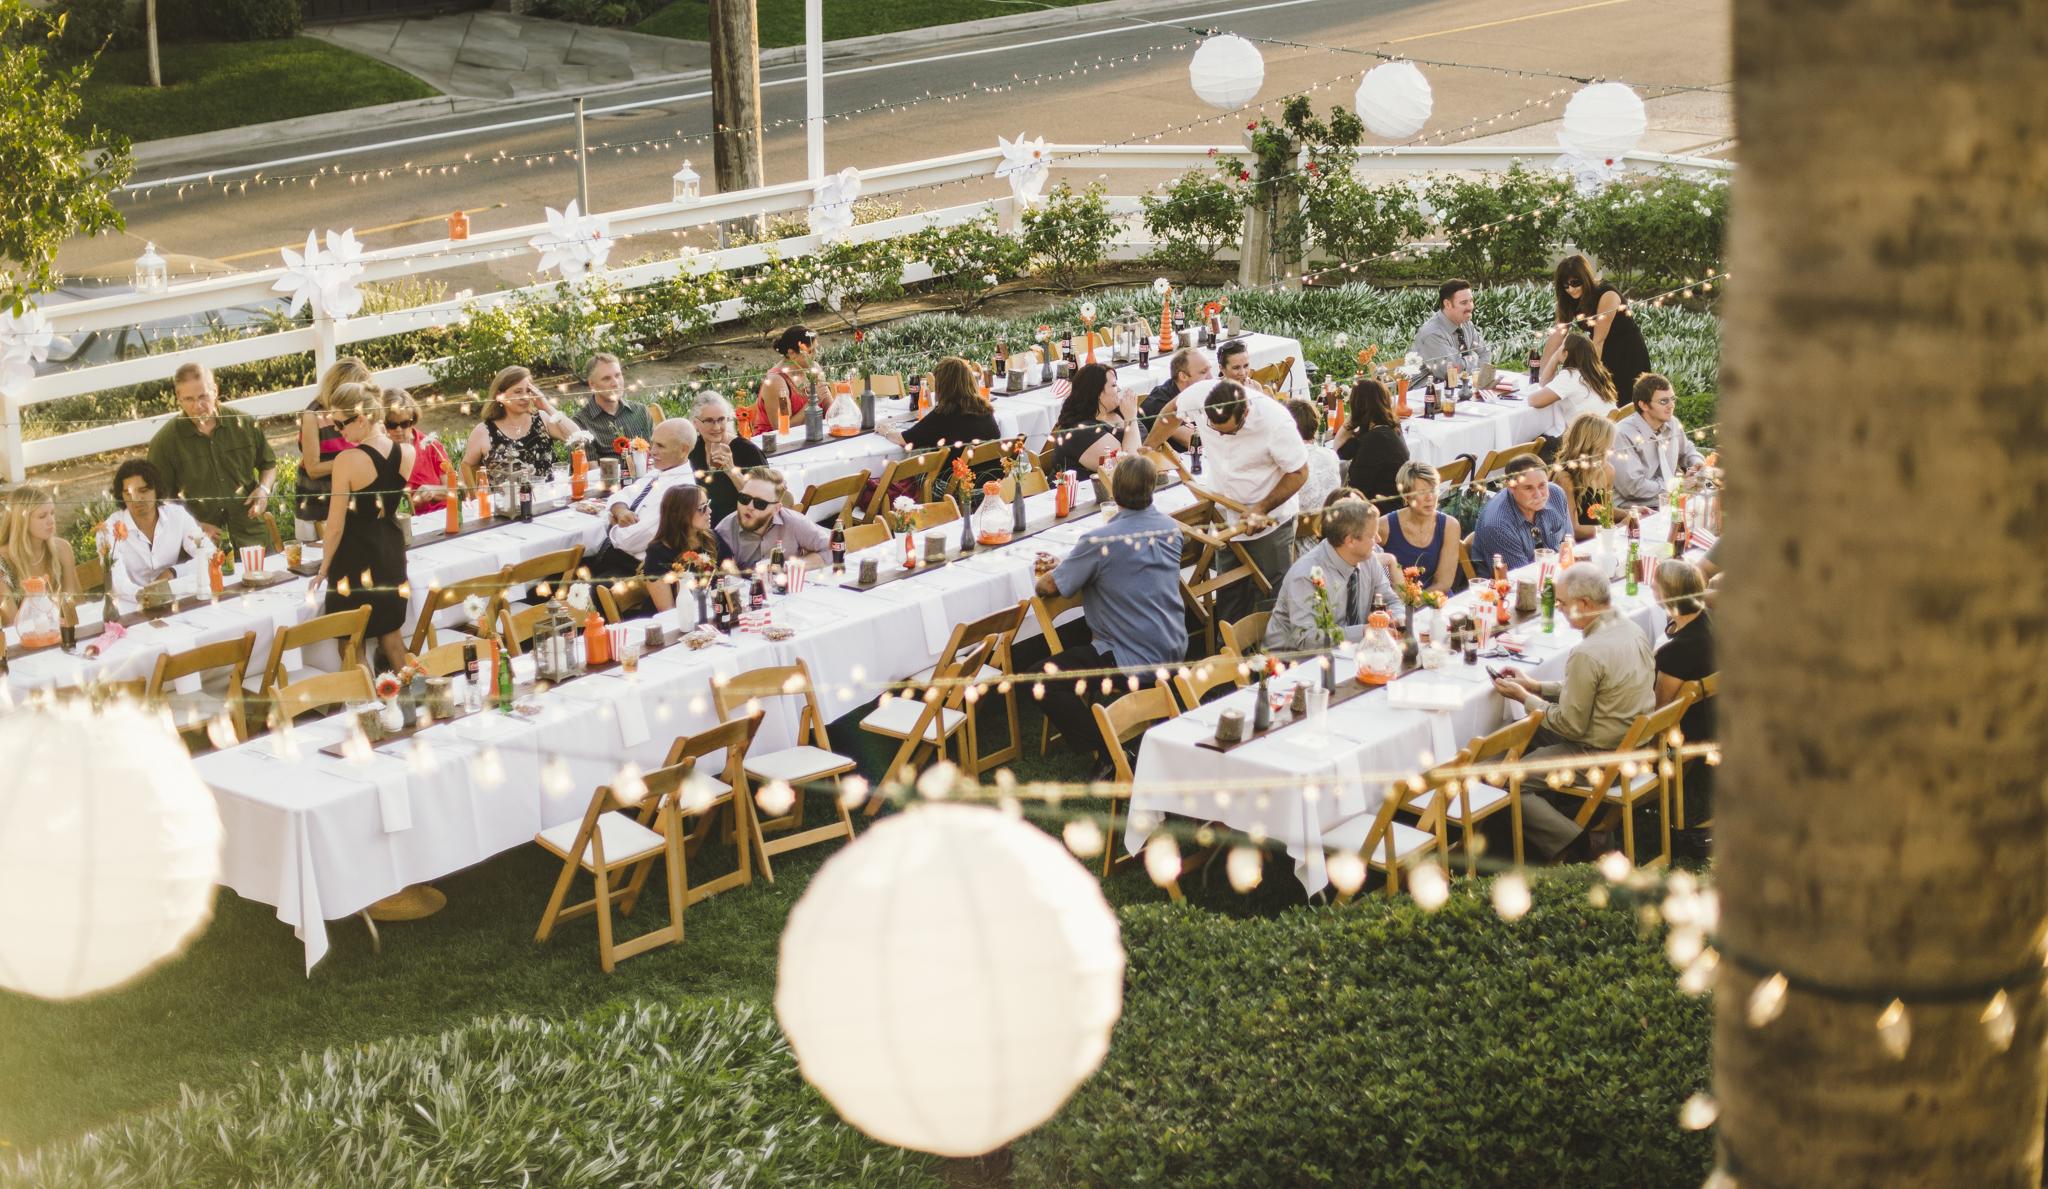 Isaiah & Taylor Photography - Los Angeles Lifestyle Wedding Photographer-44.jpg